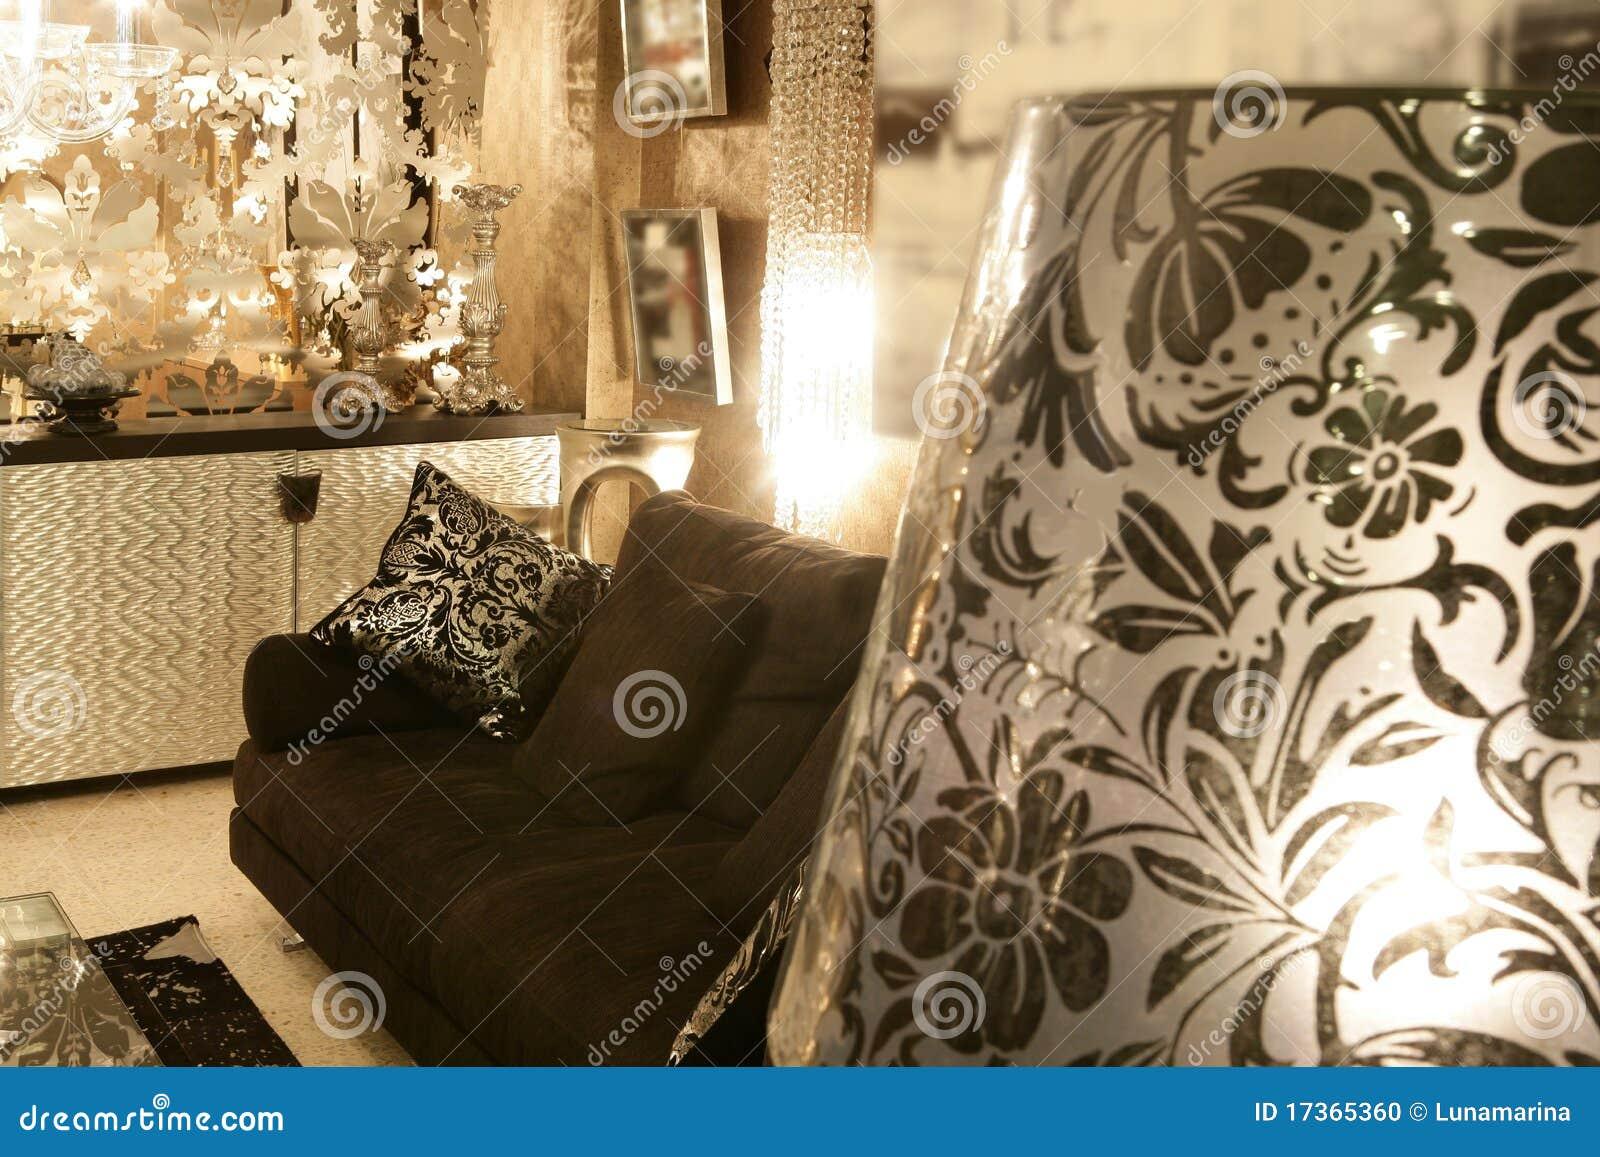 Living Room Coach Black Sofa Silver Furniture Stock Photo - Image ...